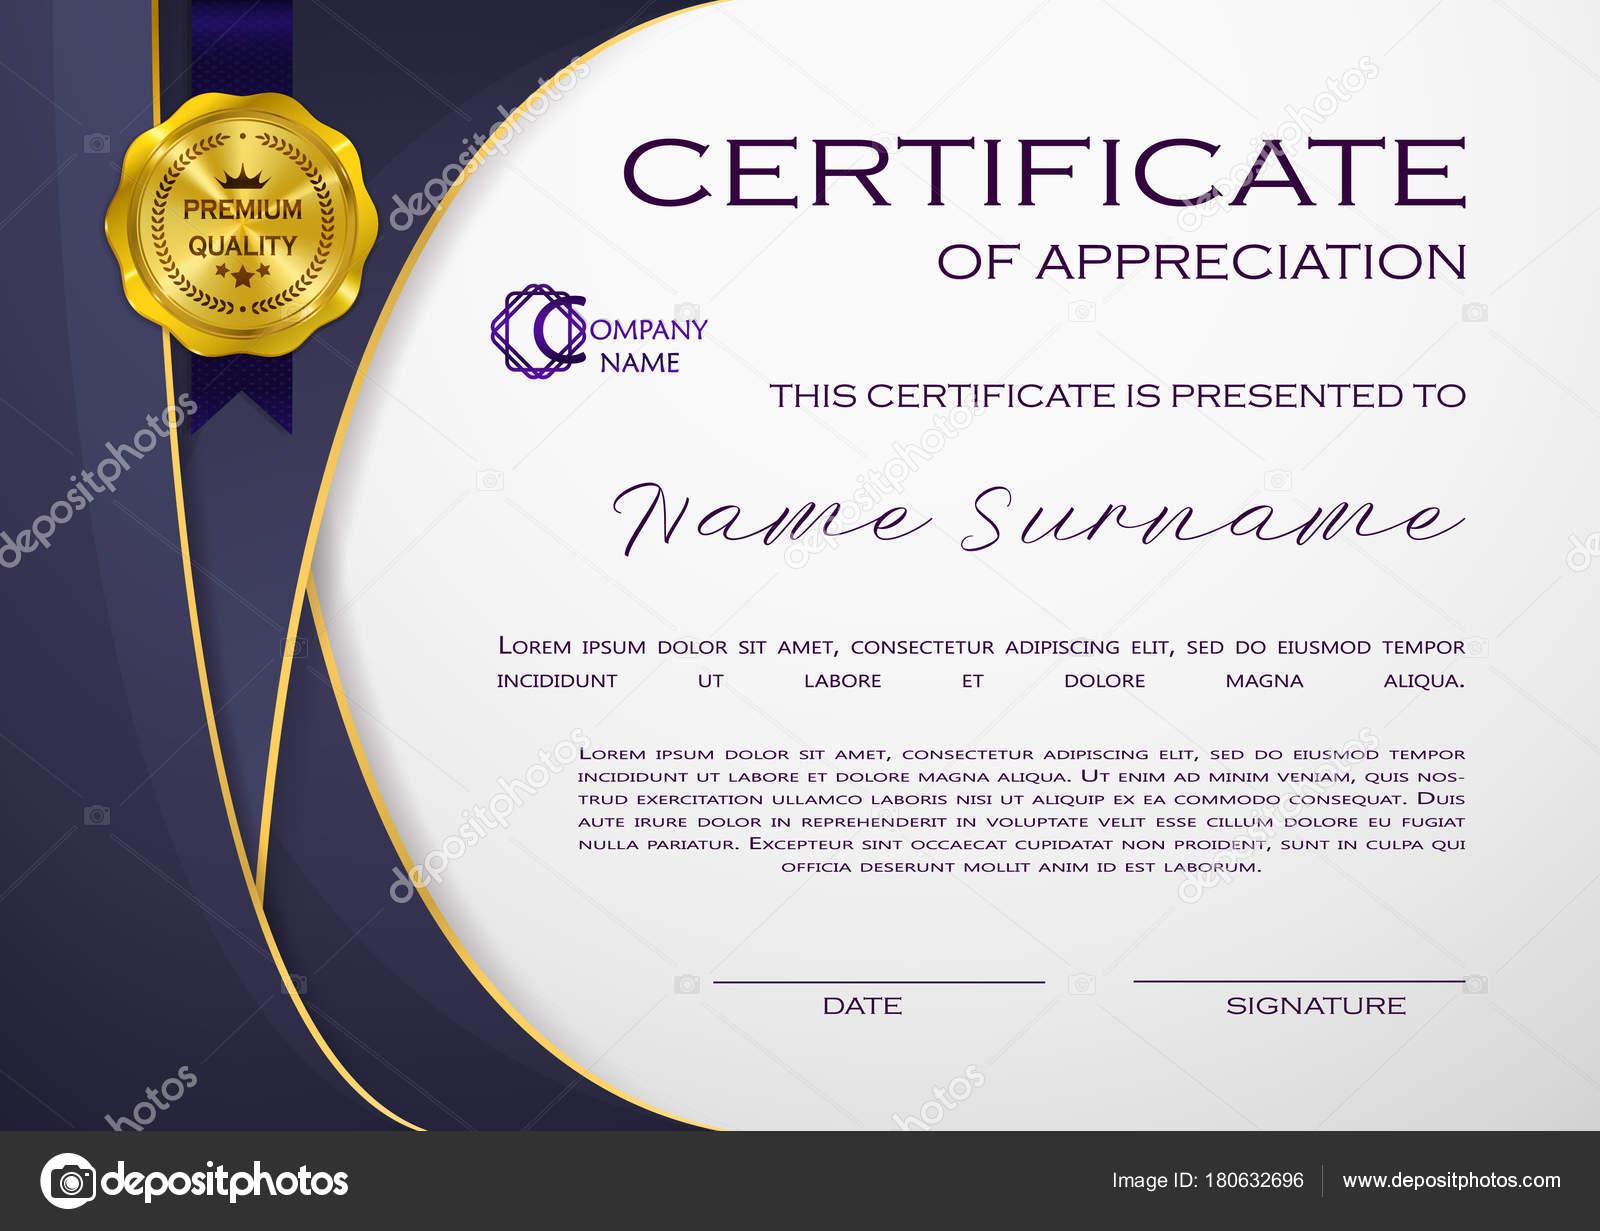 Qualification Certificate Appreciation Design Elegant Luxury Modern Pattern Best Quality